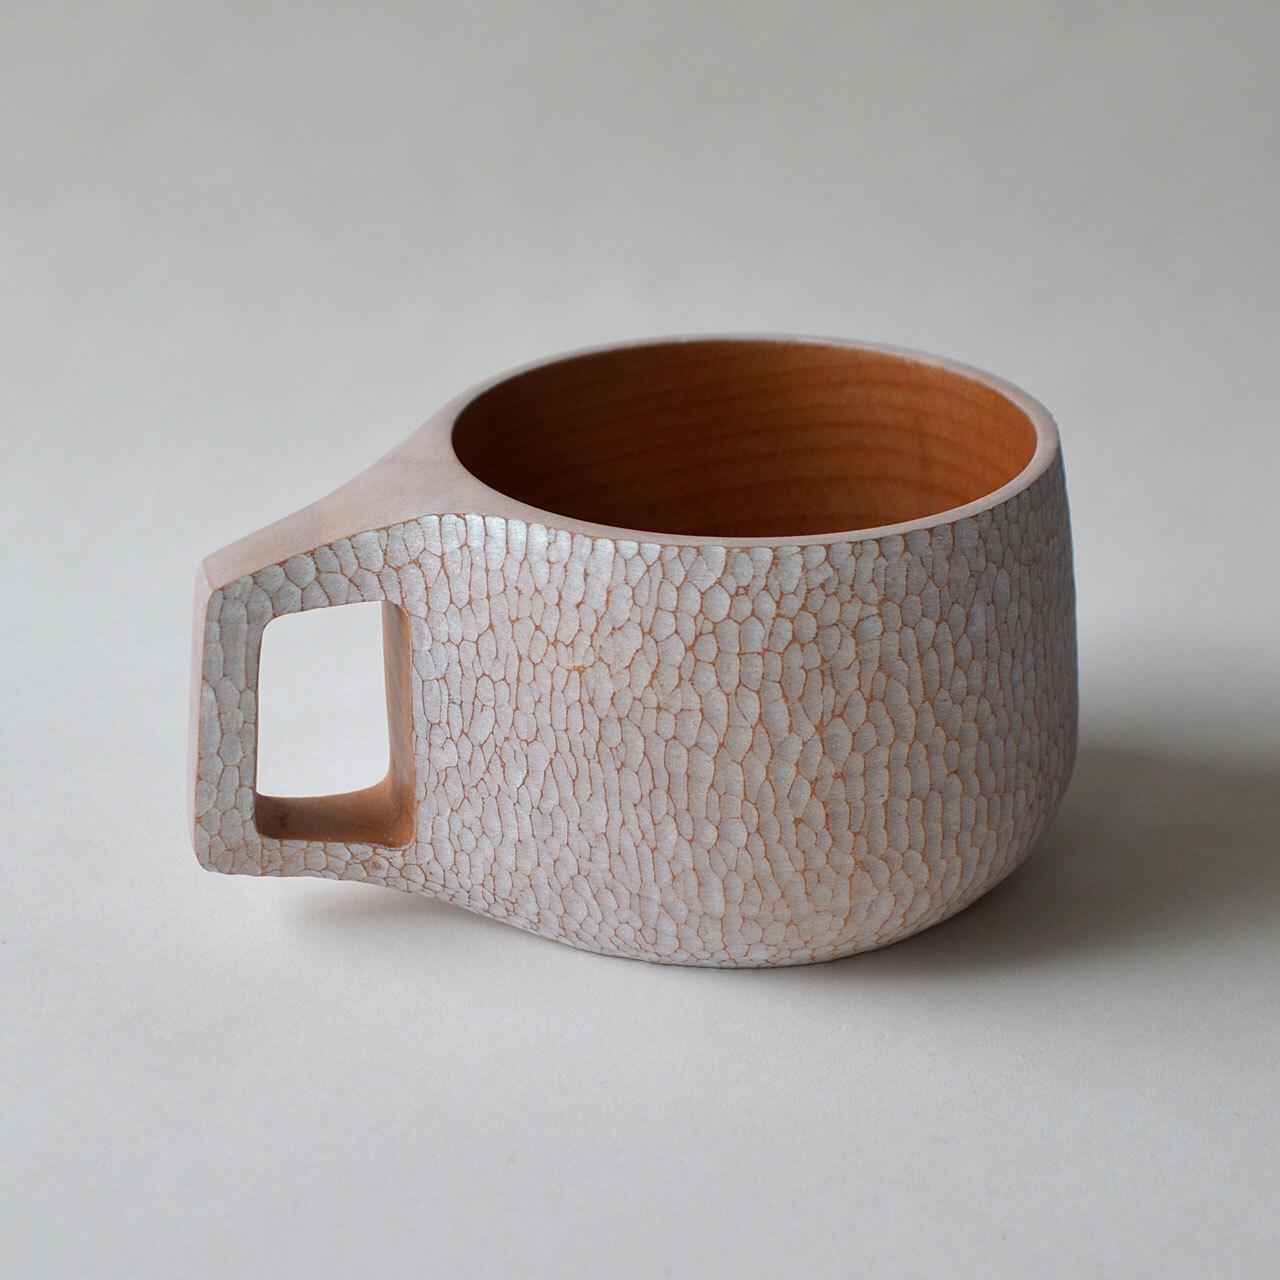 樺 BIRCH CUP - BL01